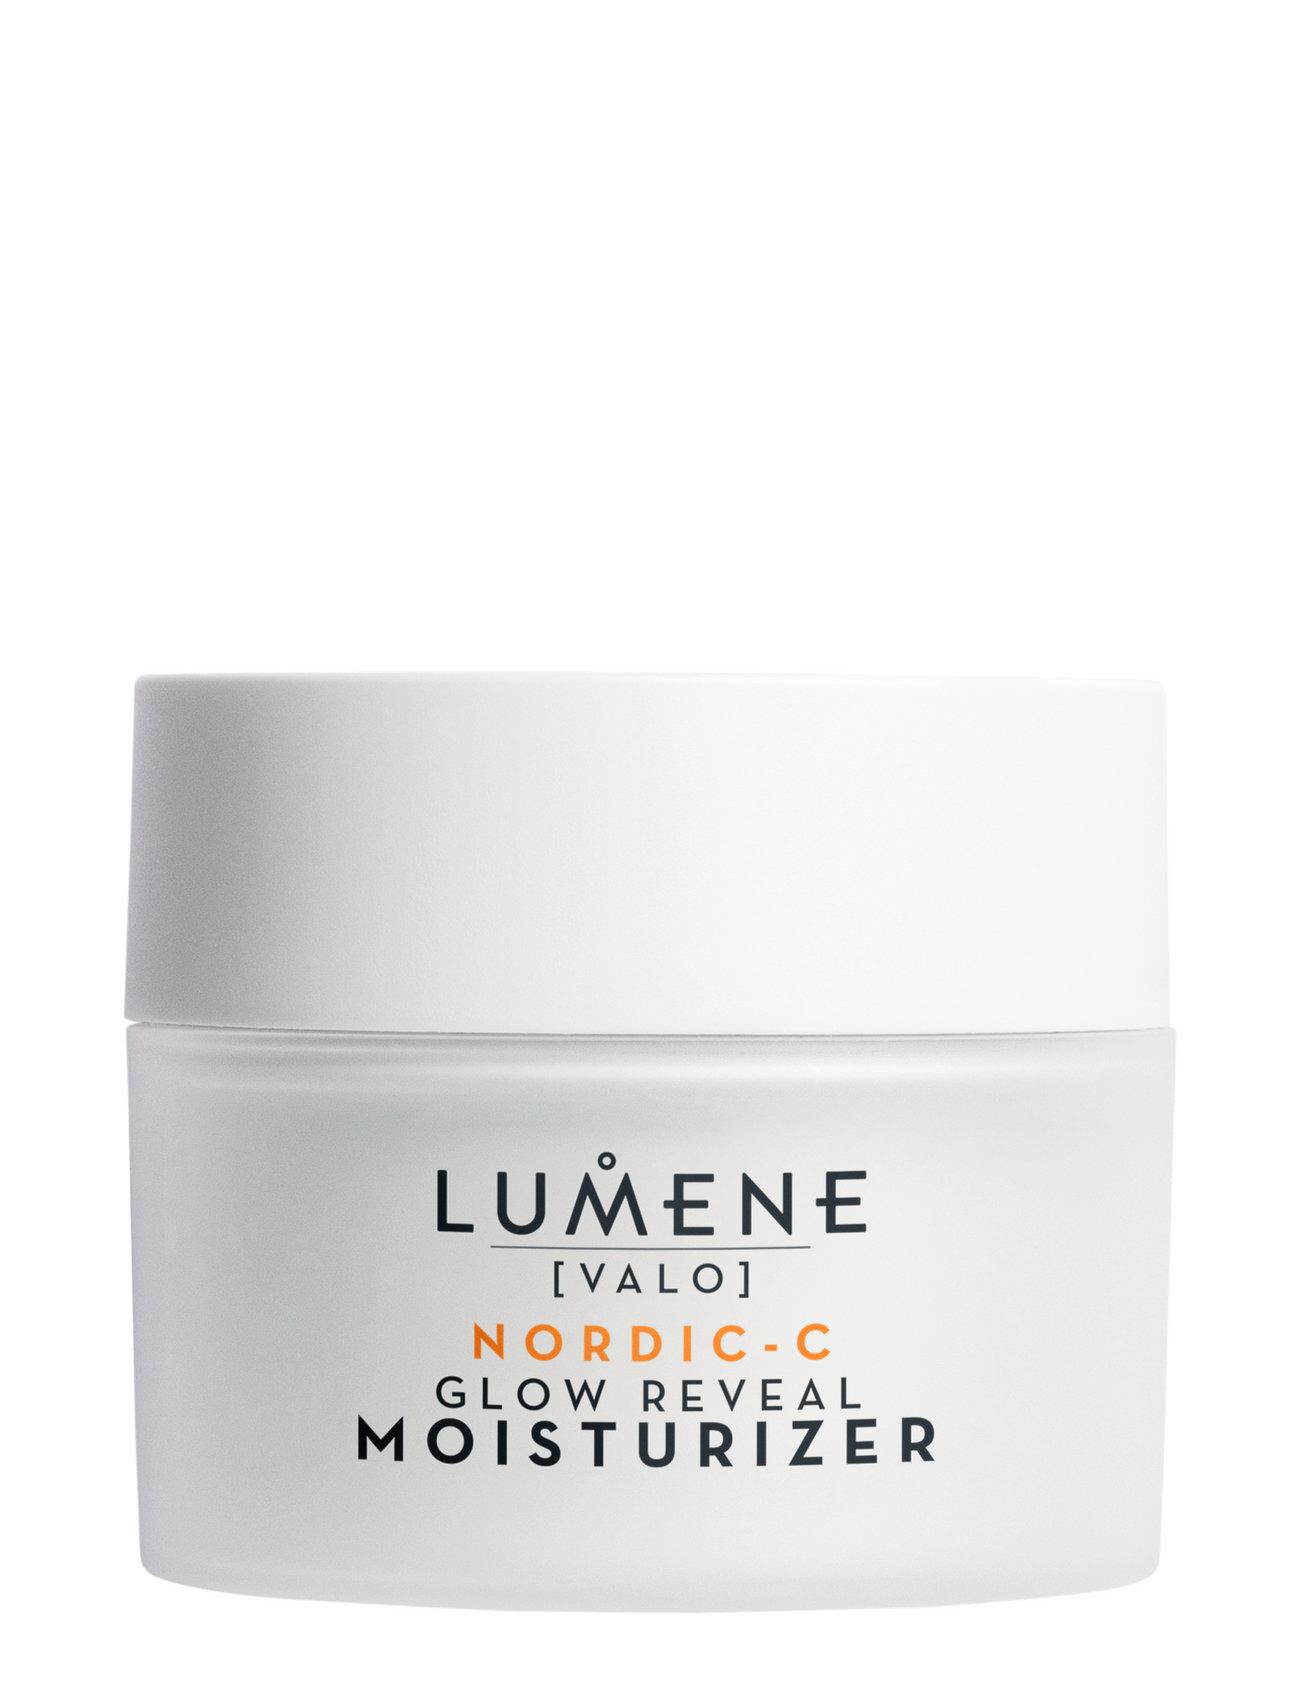 Image of Valo Nordic-C Glow Reveal Moisturizer Beauty WOMEN Skin Care Face Day Creams Nude LUMENE (3346815839)